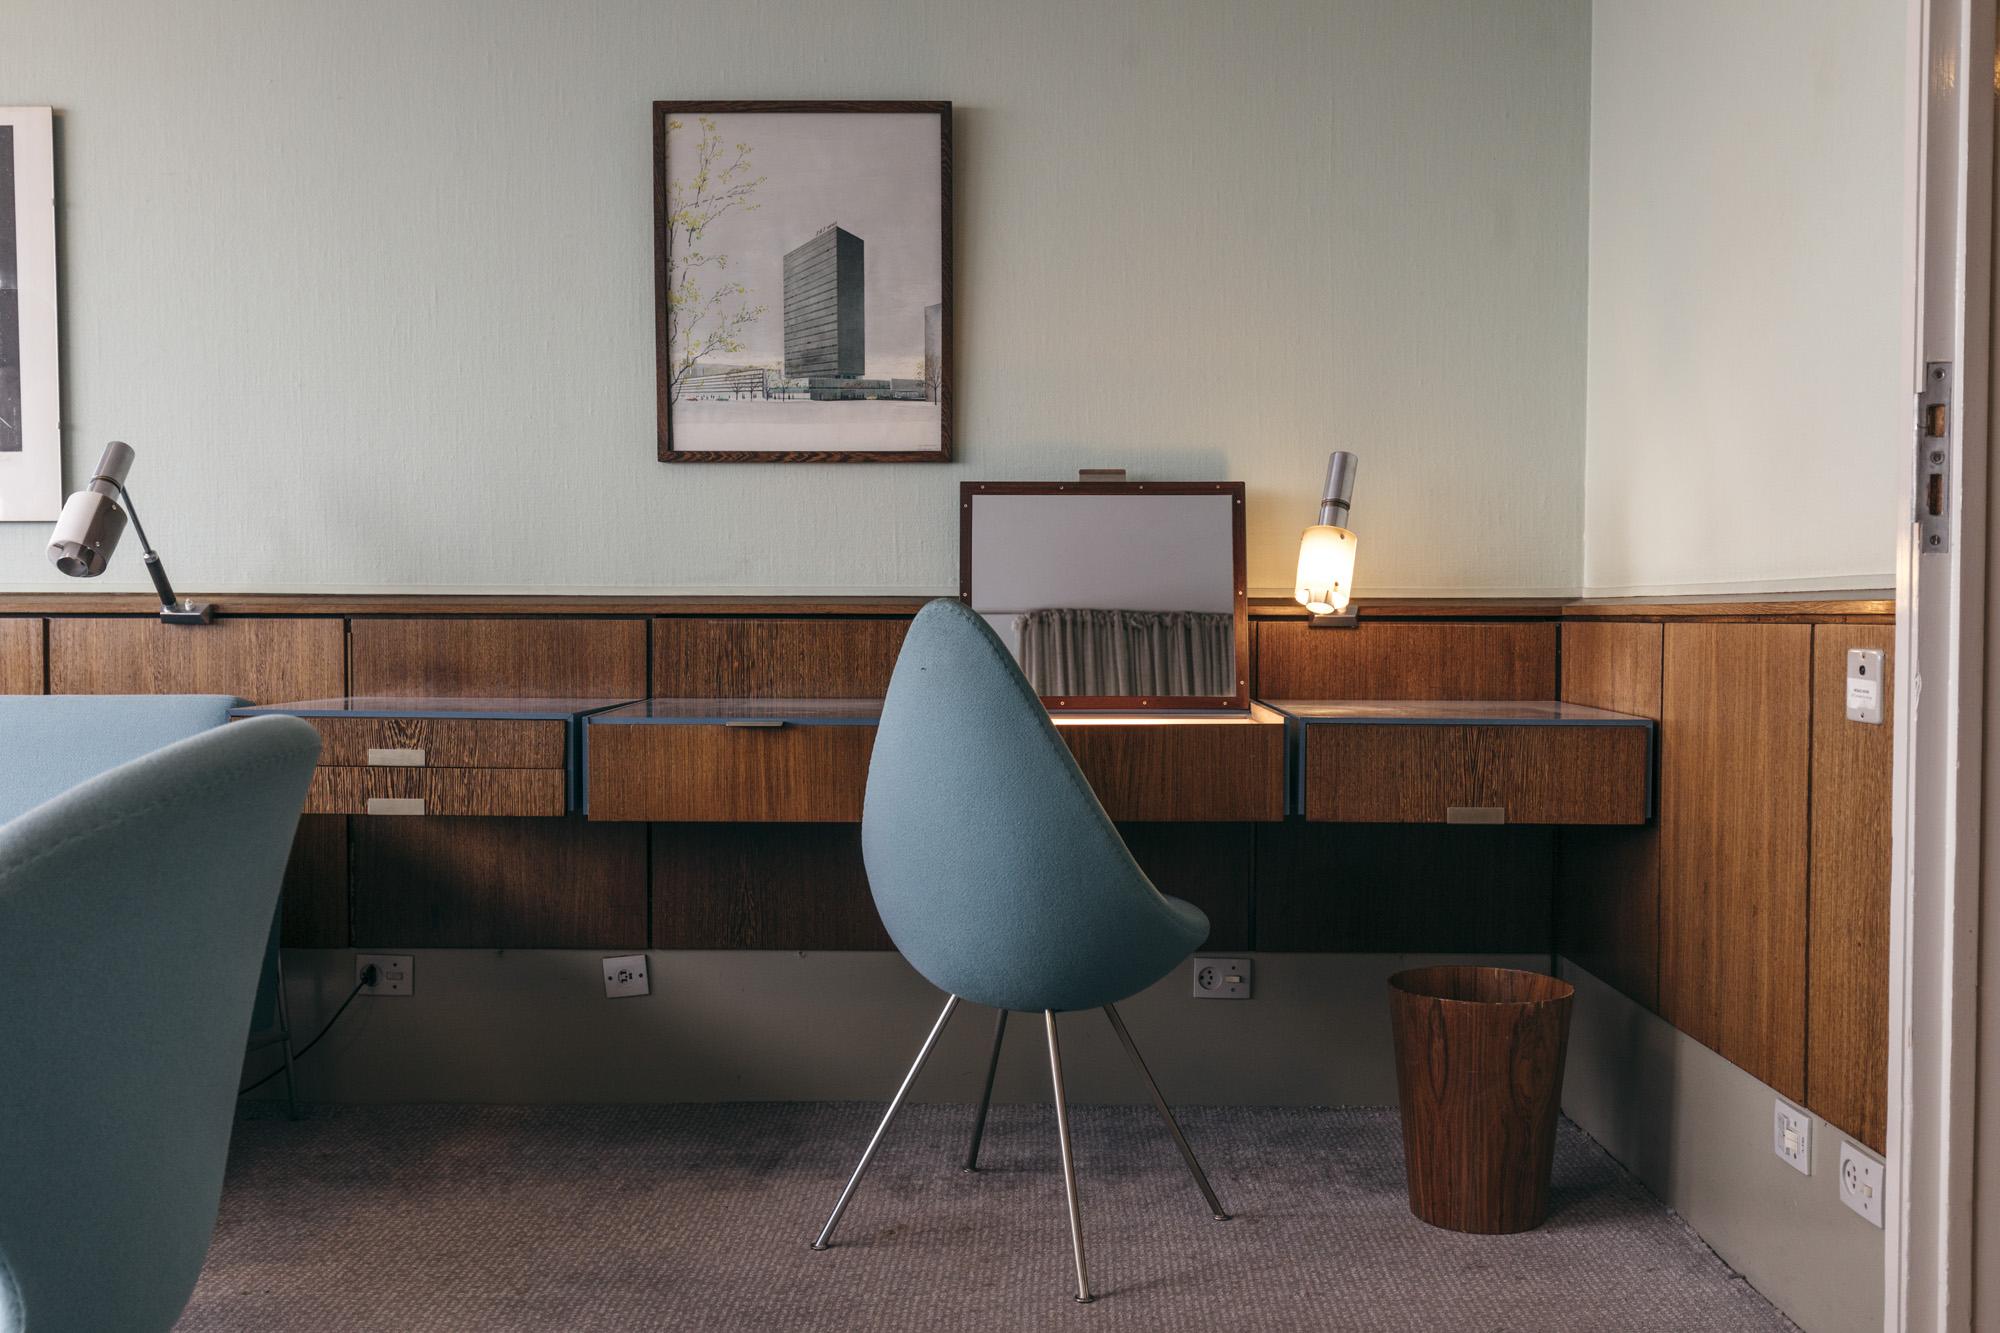 Andreas_Raun_Photographer_Radisson_Collection_Hotel_QuartzARA_8391.jpg